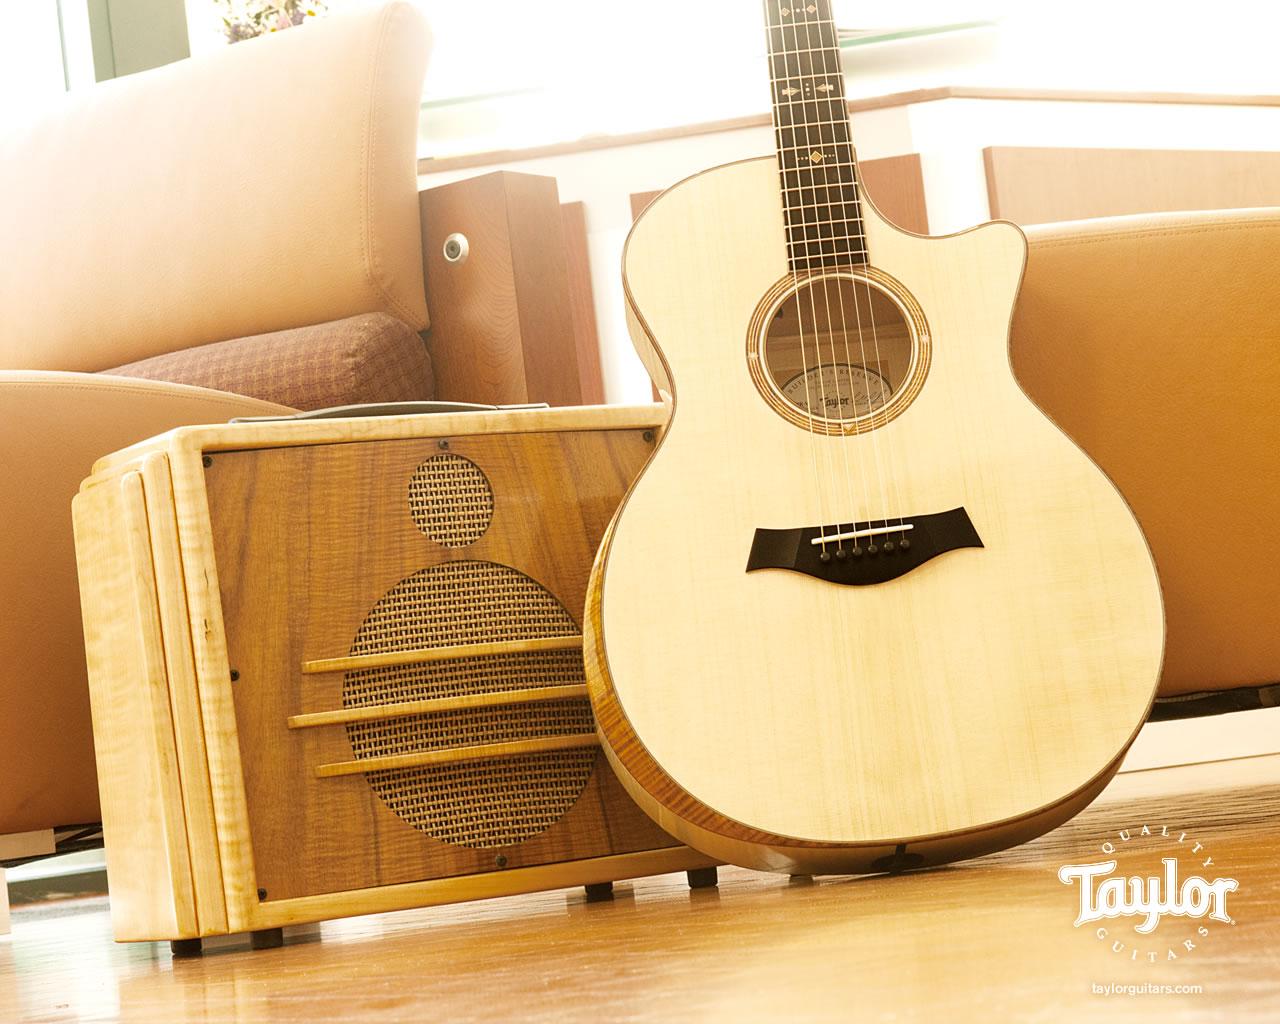 taylor guitars wallpapers - photo #15